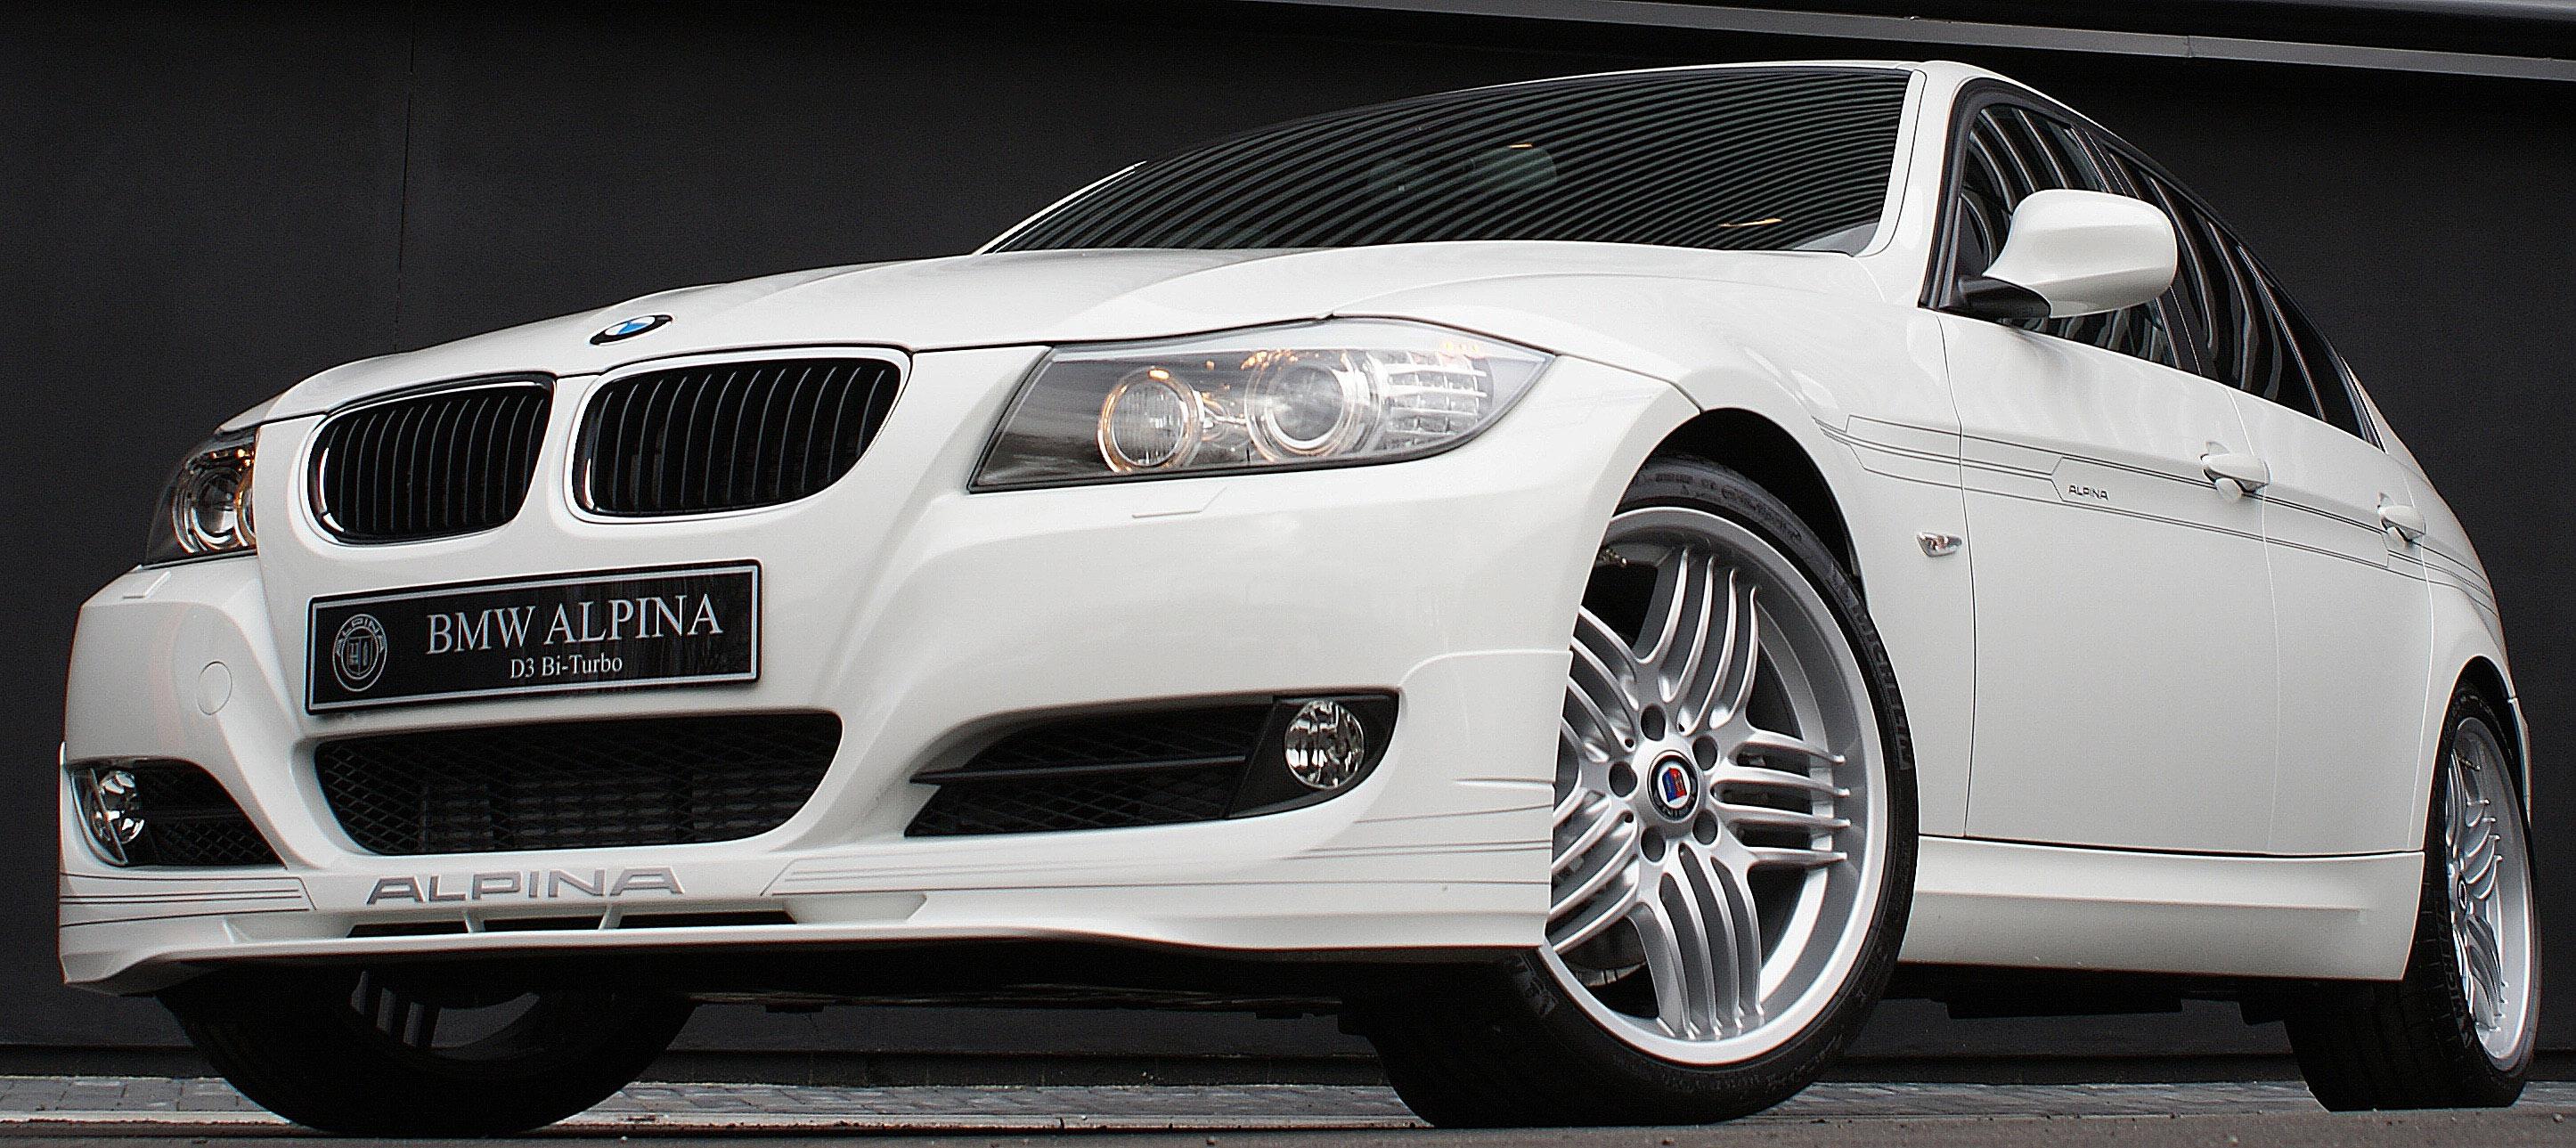 BMW ALPINA D3 Bi-Turbo седан - фотография №1